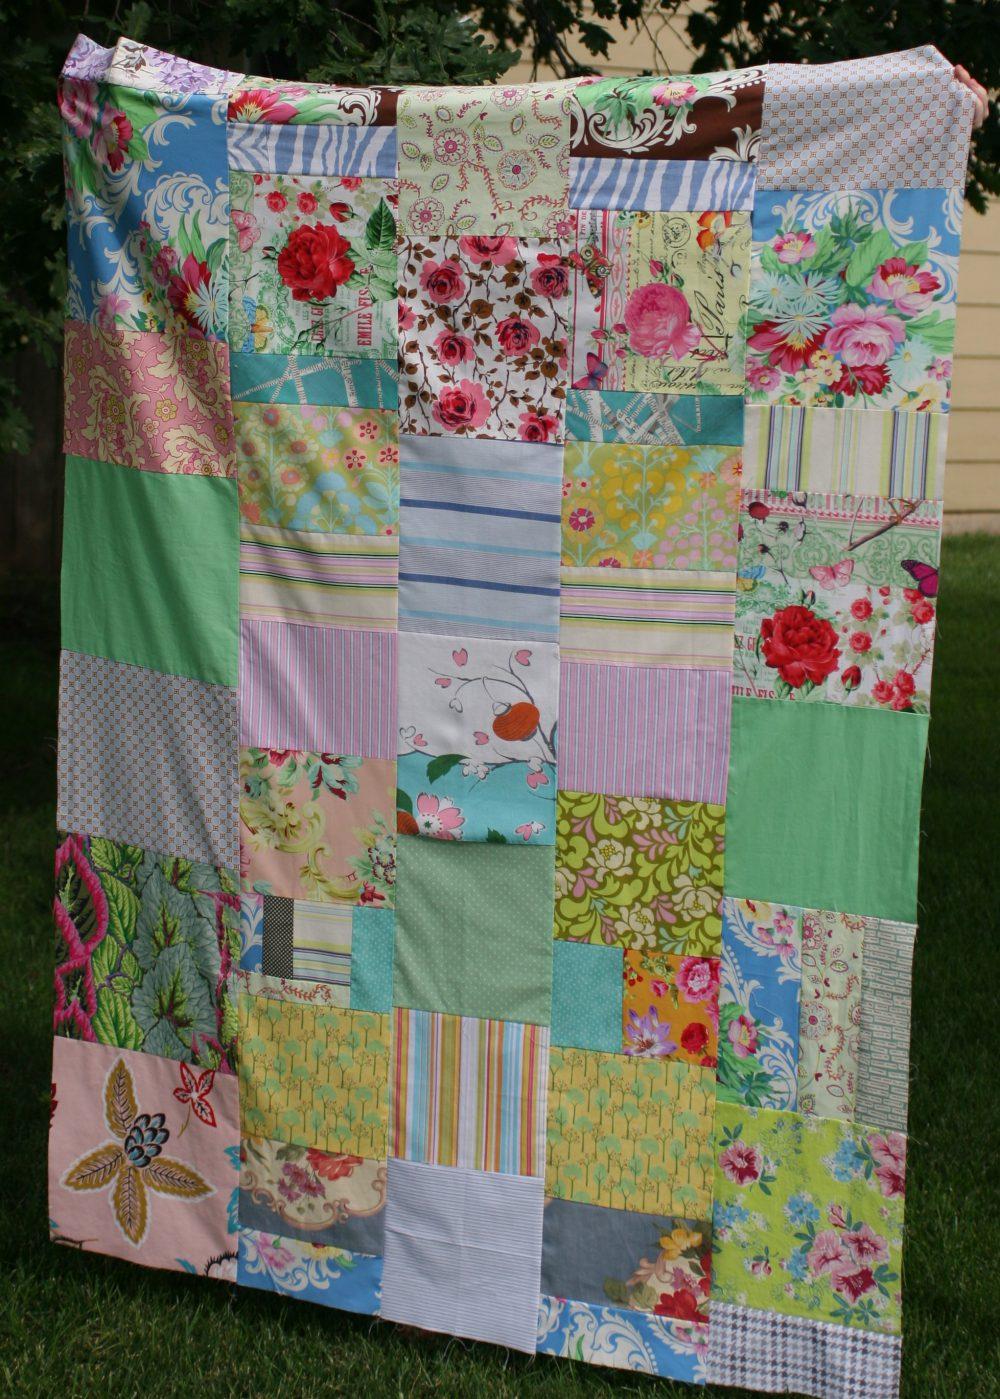 Large patchwork quilt 2016 Lovingcolor S. Macera